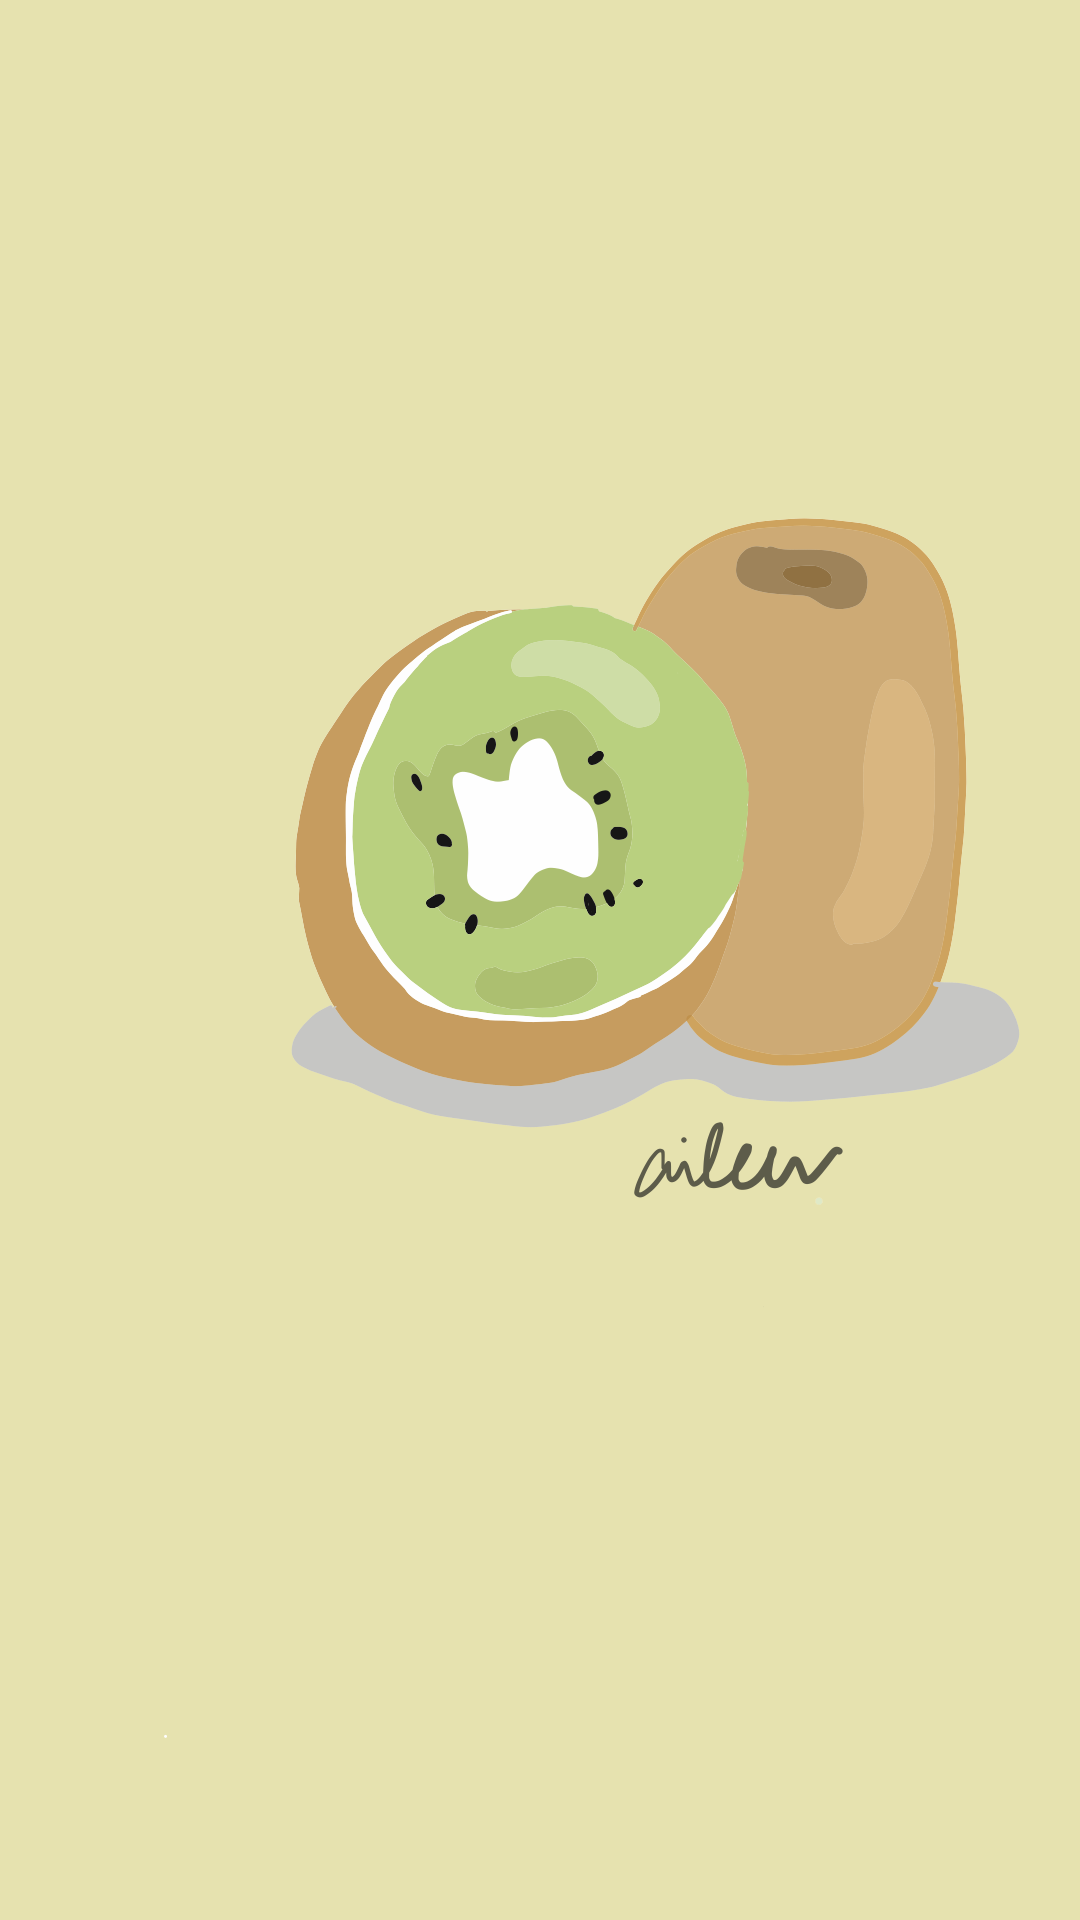 Kiwi Had dried kiwi and it tasted good